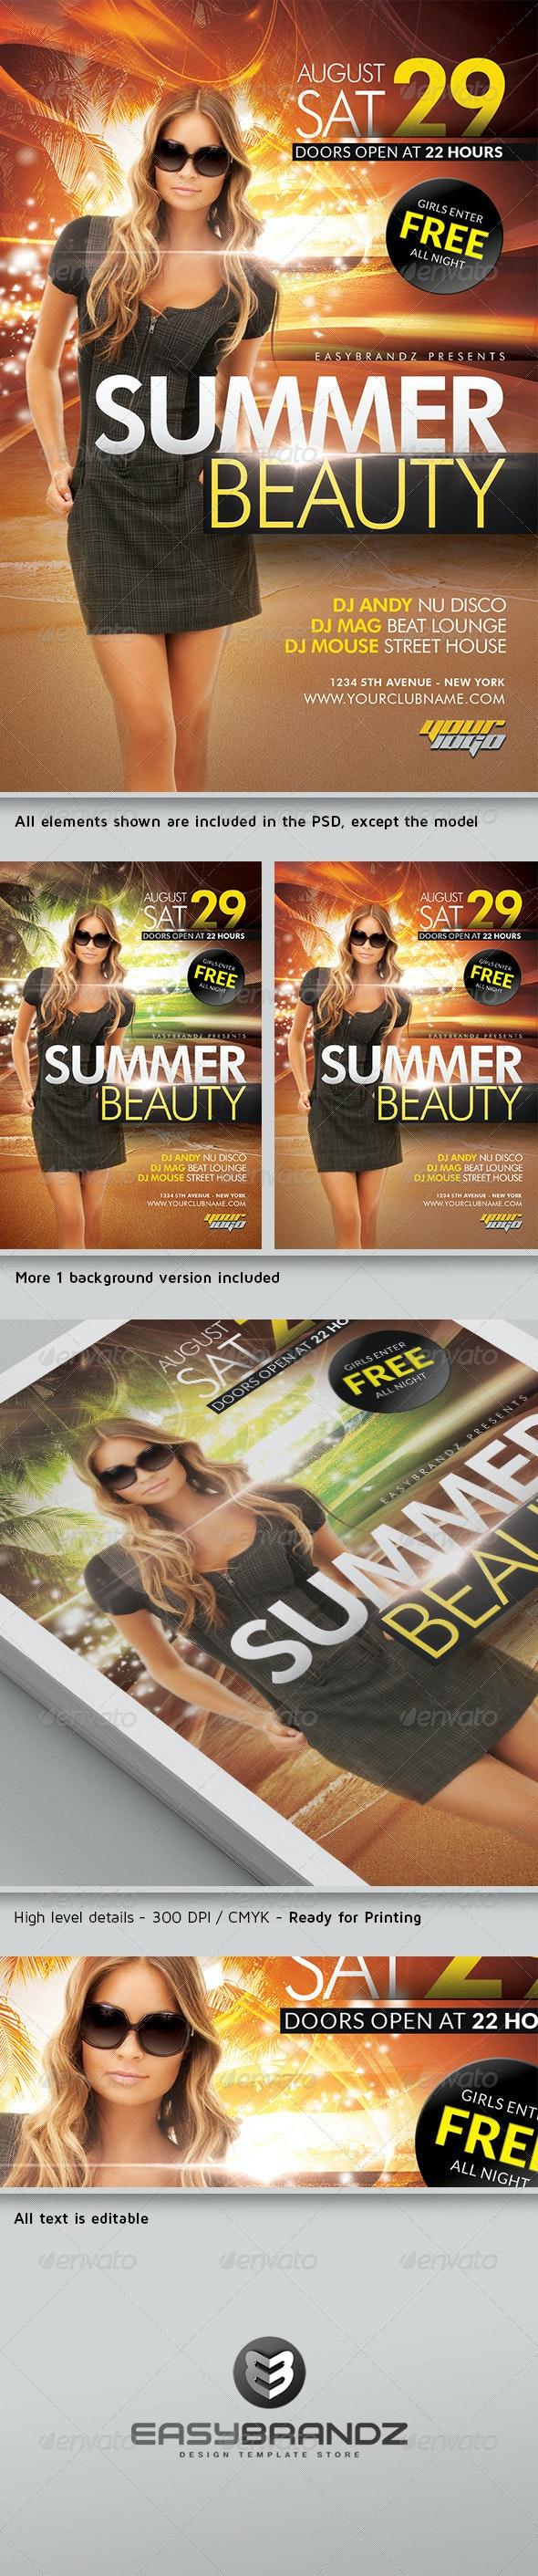 Summer Beauty Flyer Template - Events Flyers